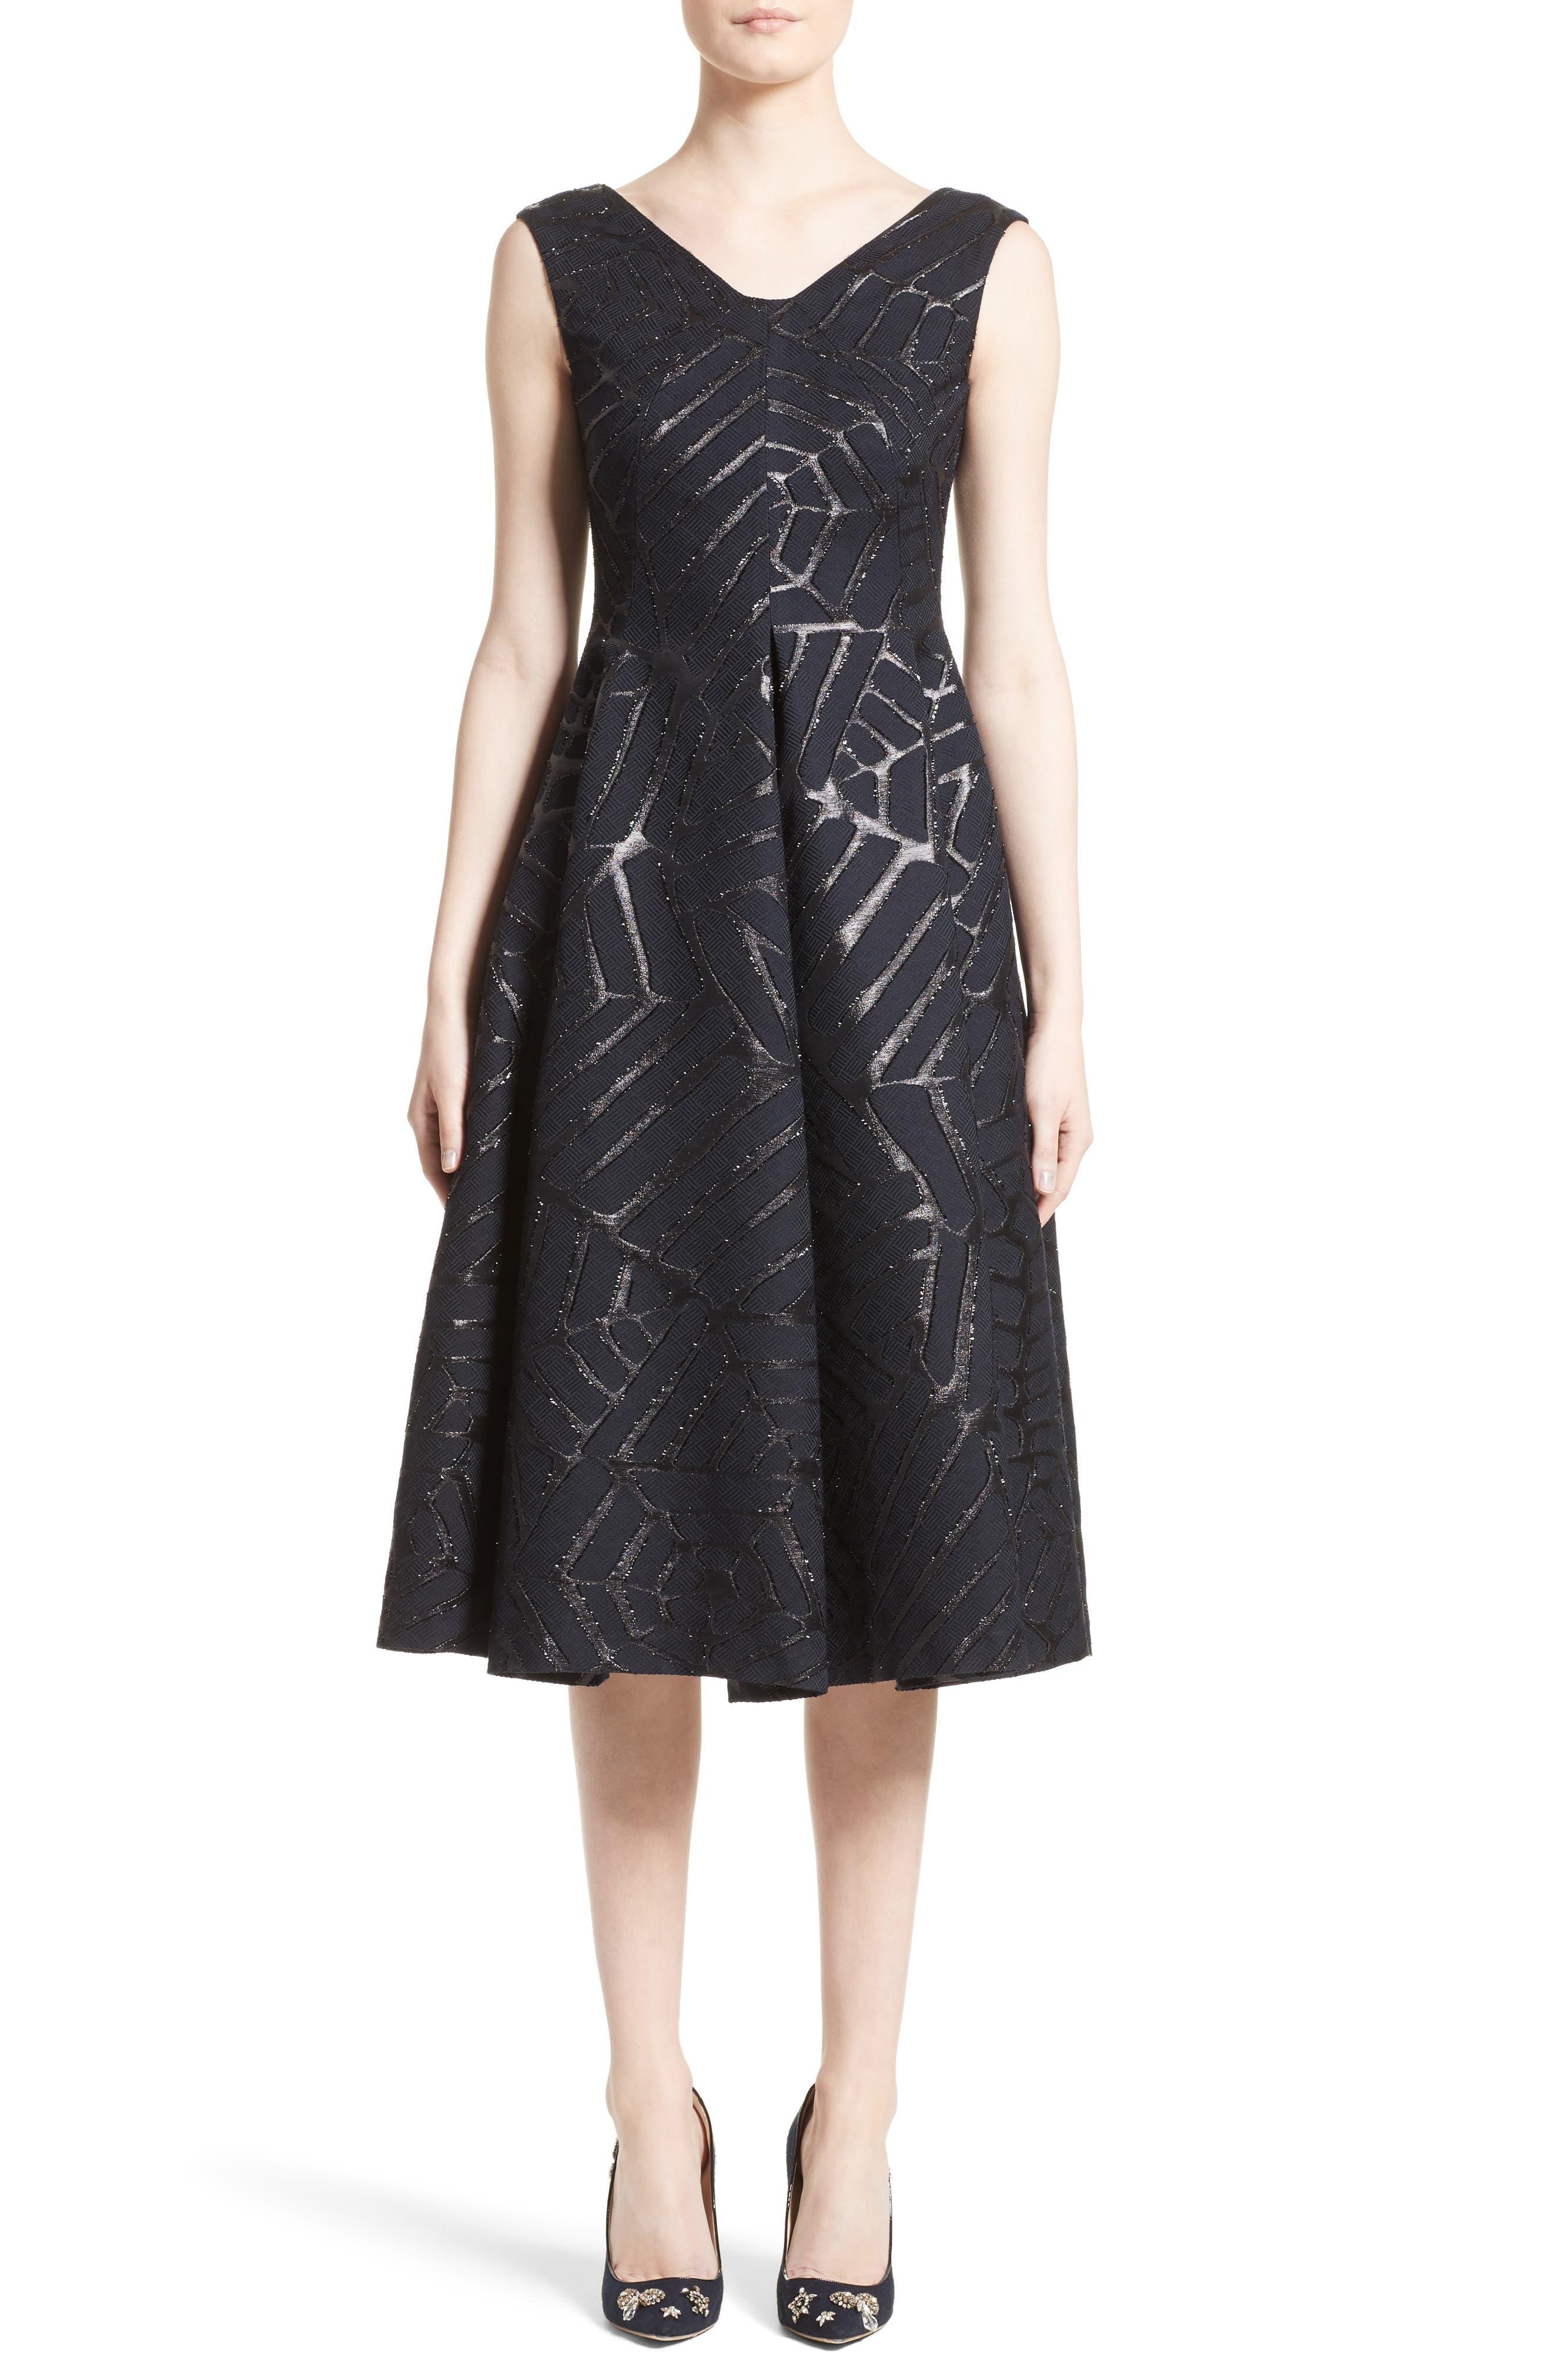 Main Image - Talbot Runhof Shimmer Fil Coupé Cocktail Dress